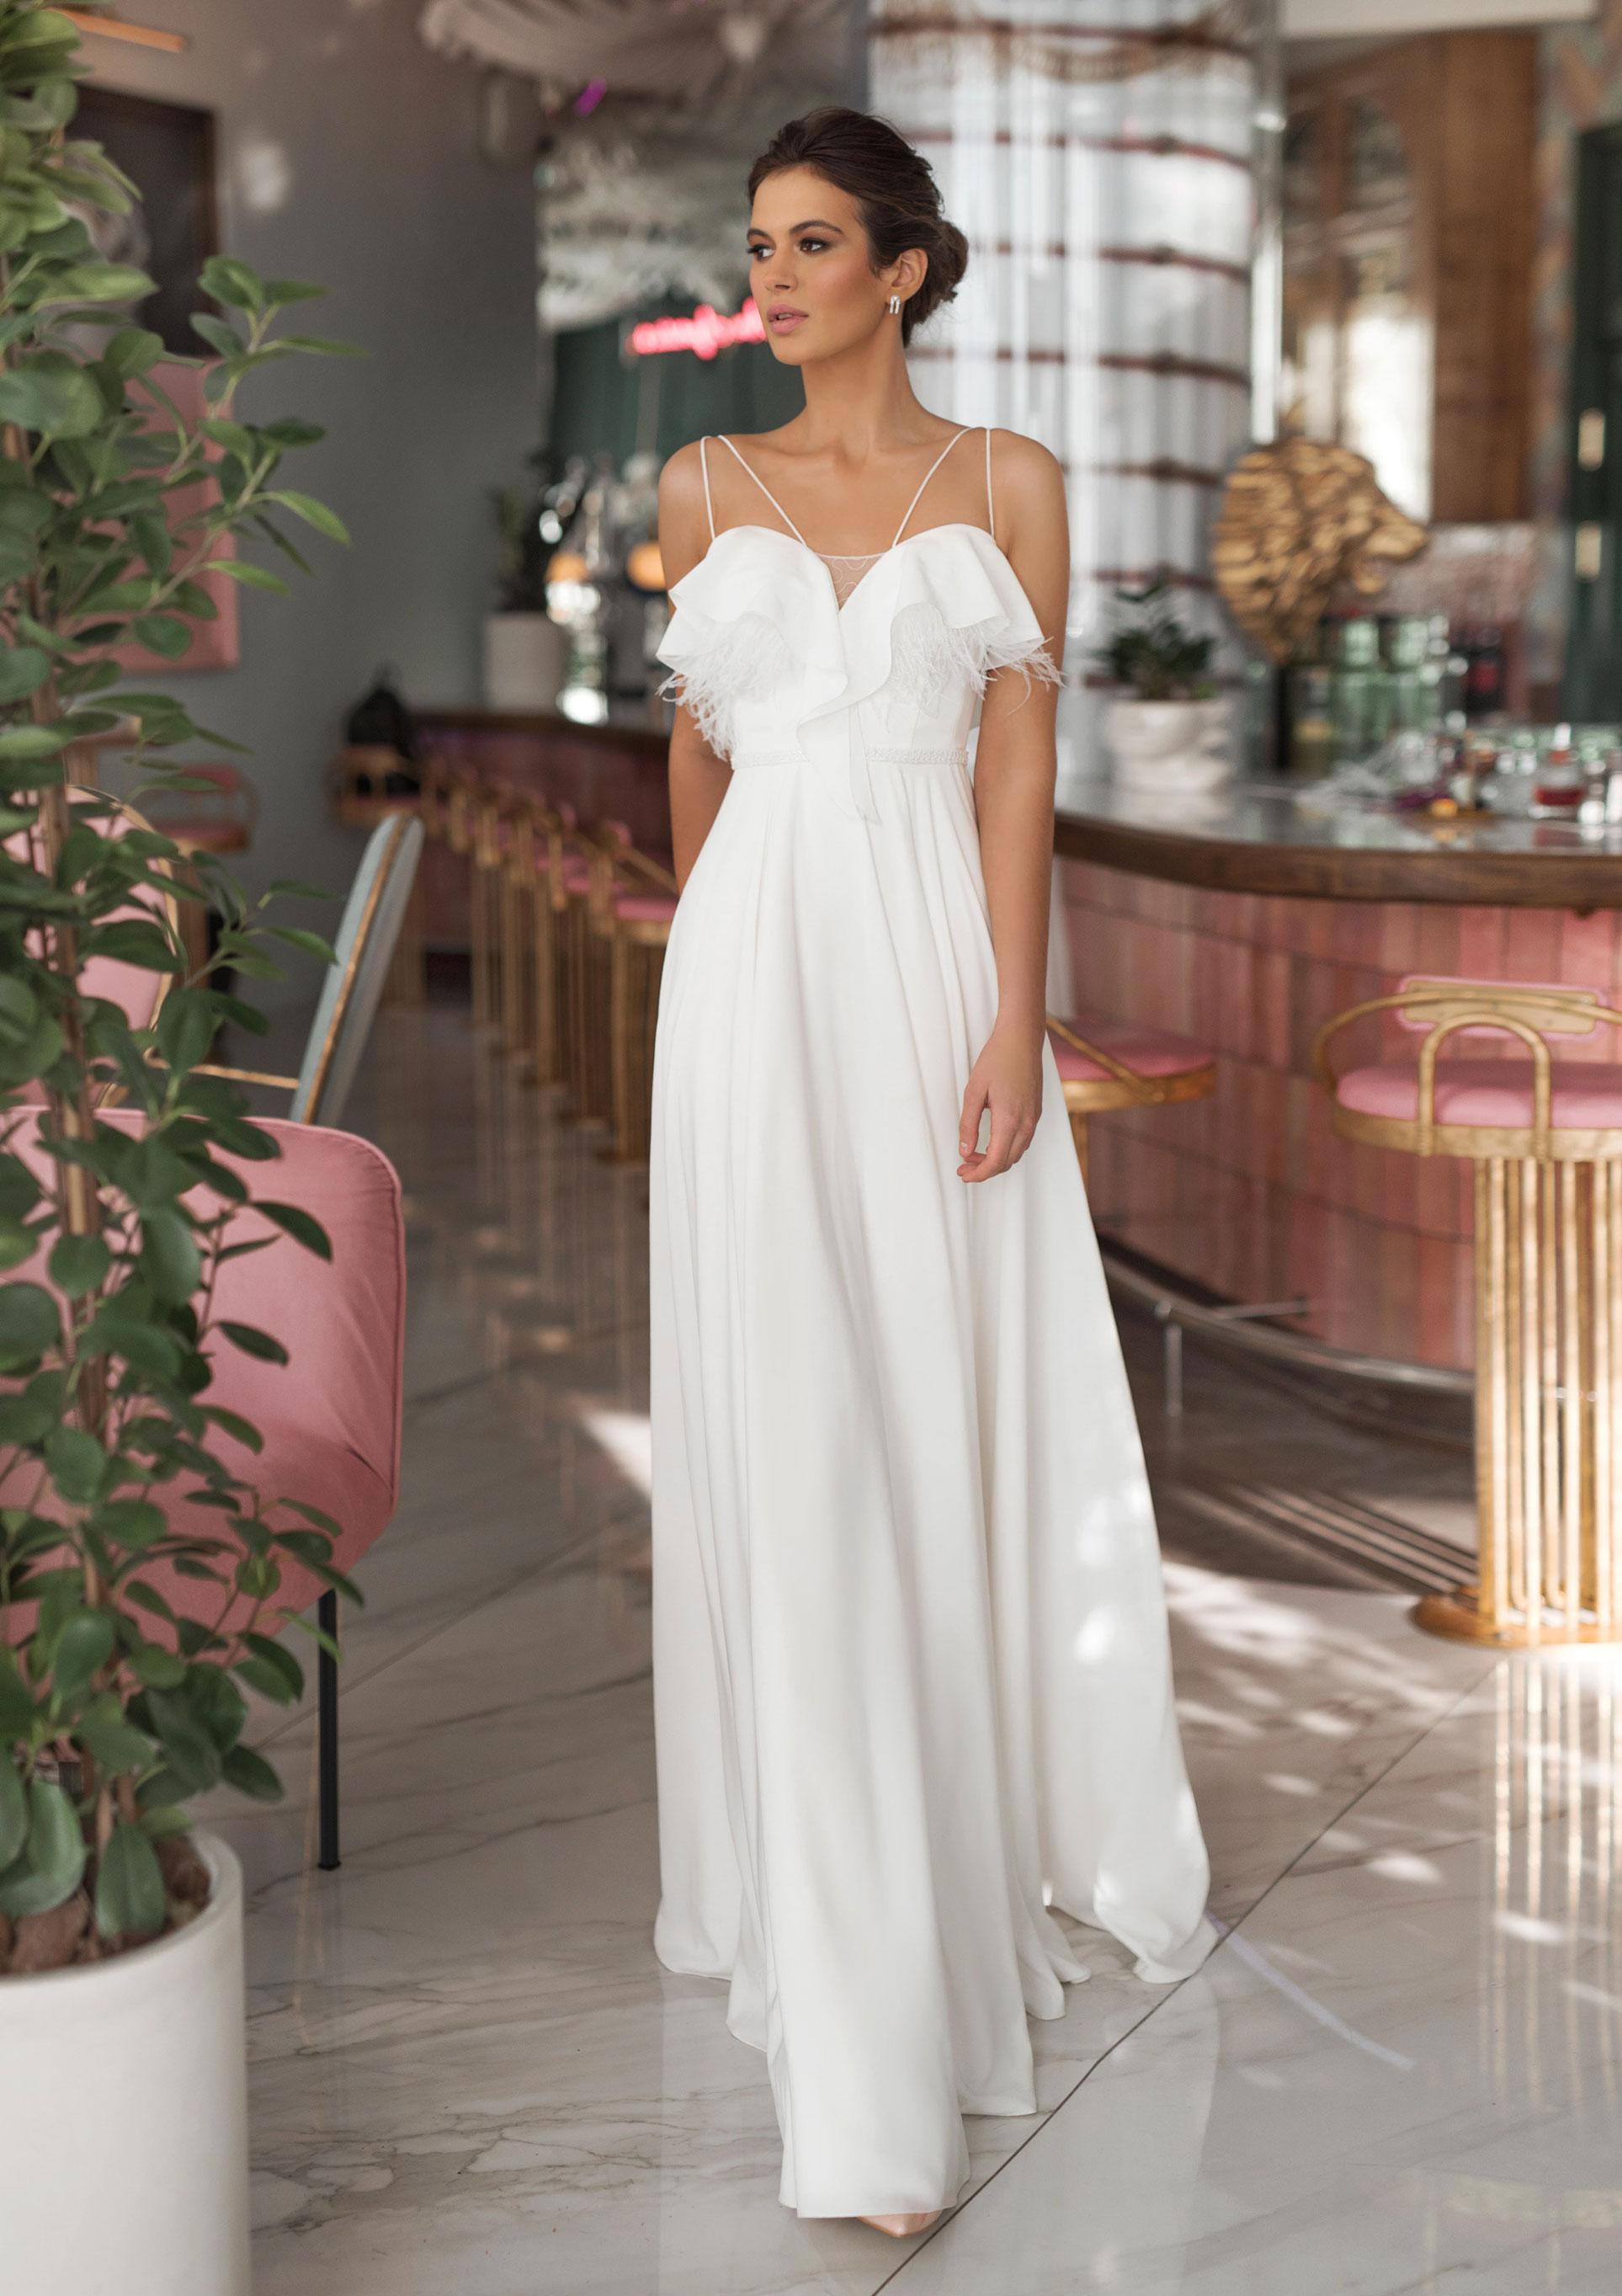 Ксения Саладуха в свадебных нарядах Ave Wedding, весна-лето 2019 / фото 03